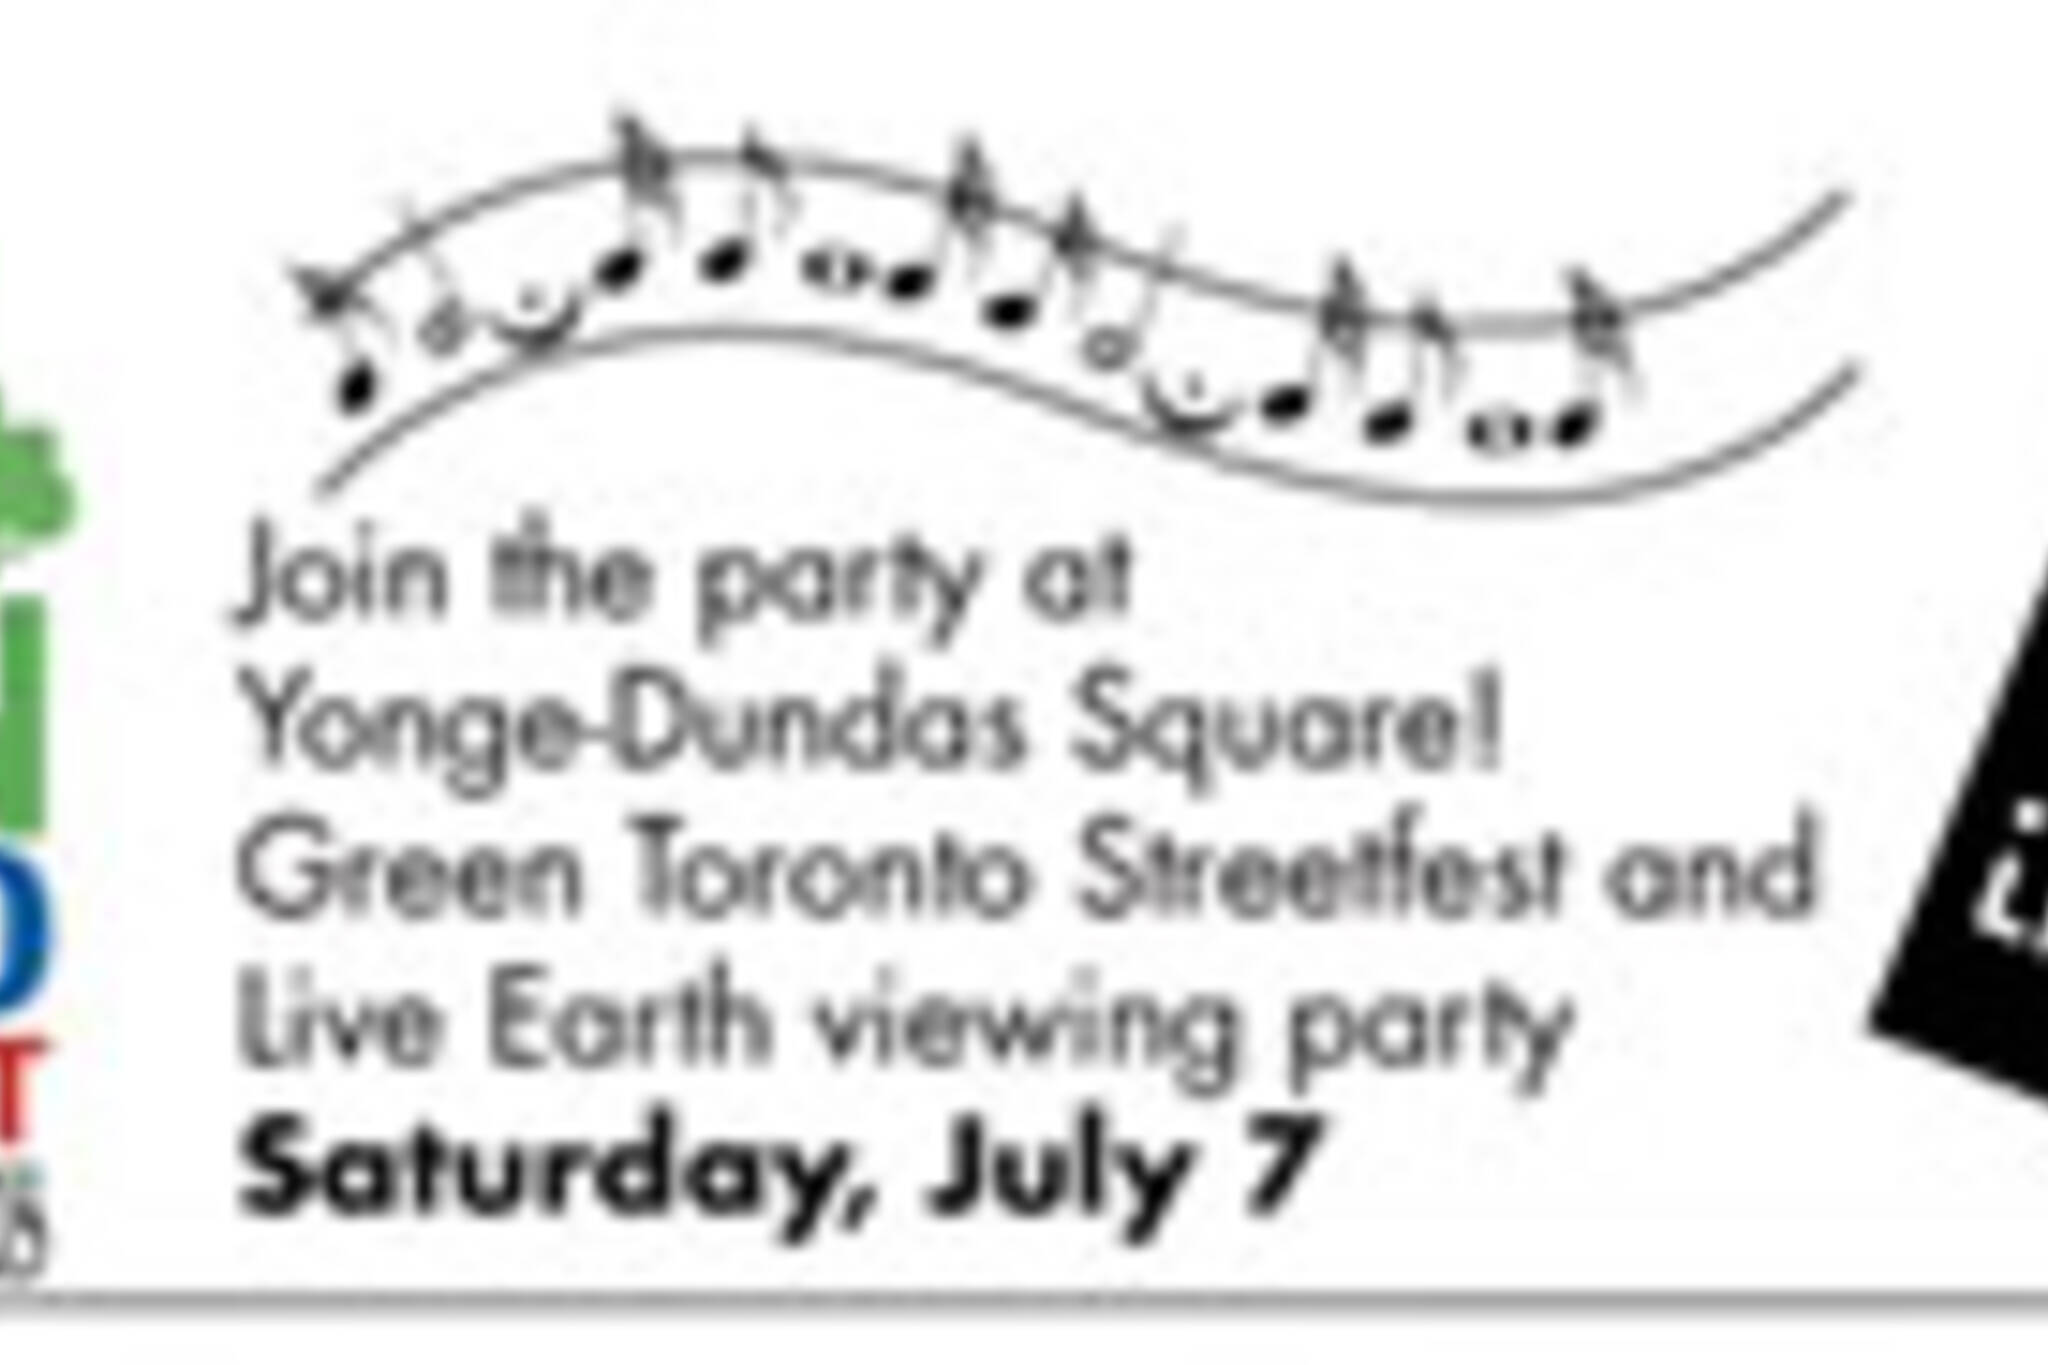 20070704_streetfestgreen_poster.jpg